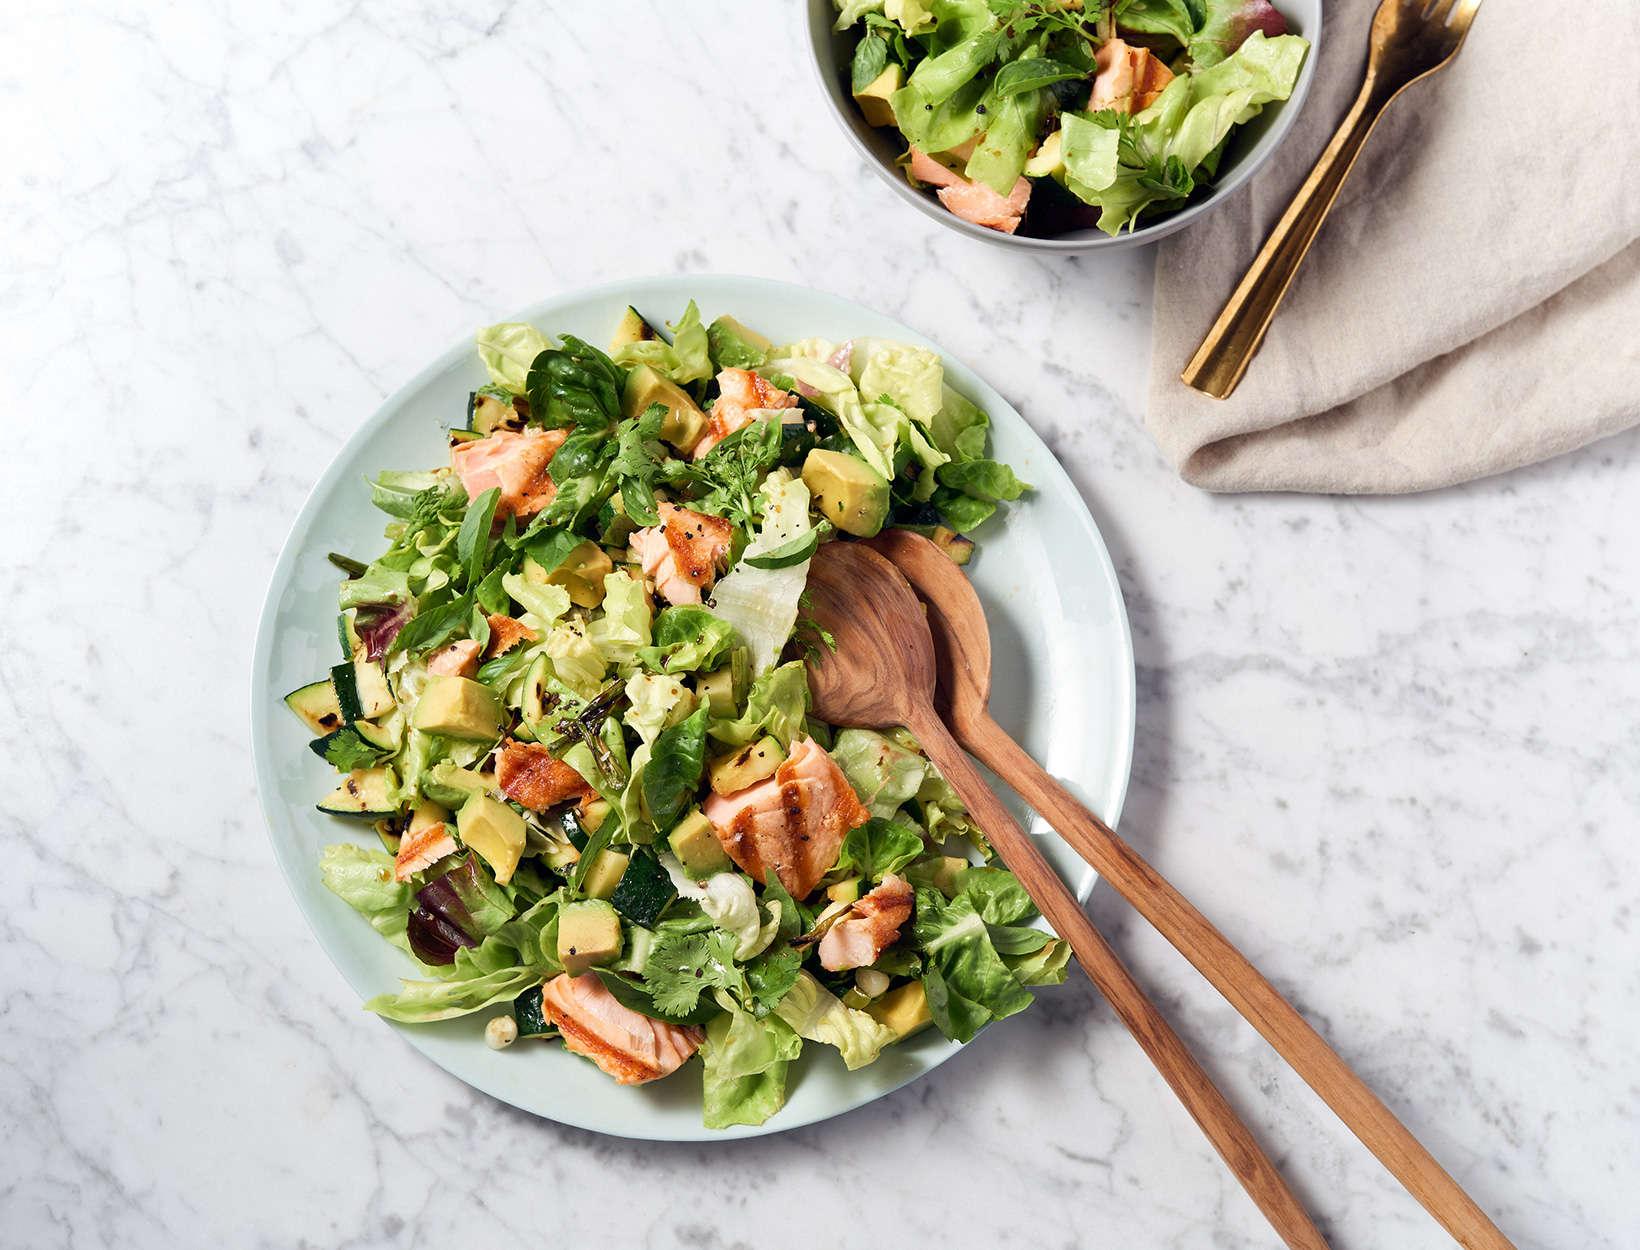 My Ivy Chopped Salad Reinterpreted